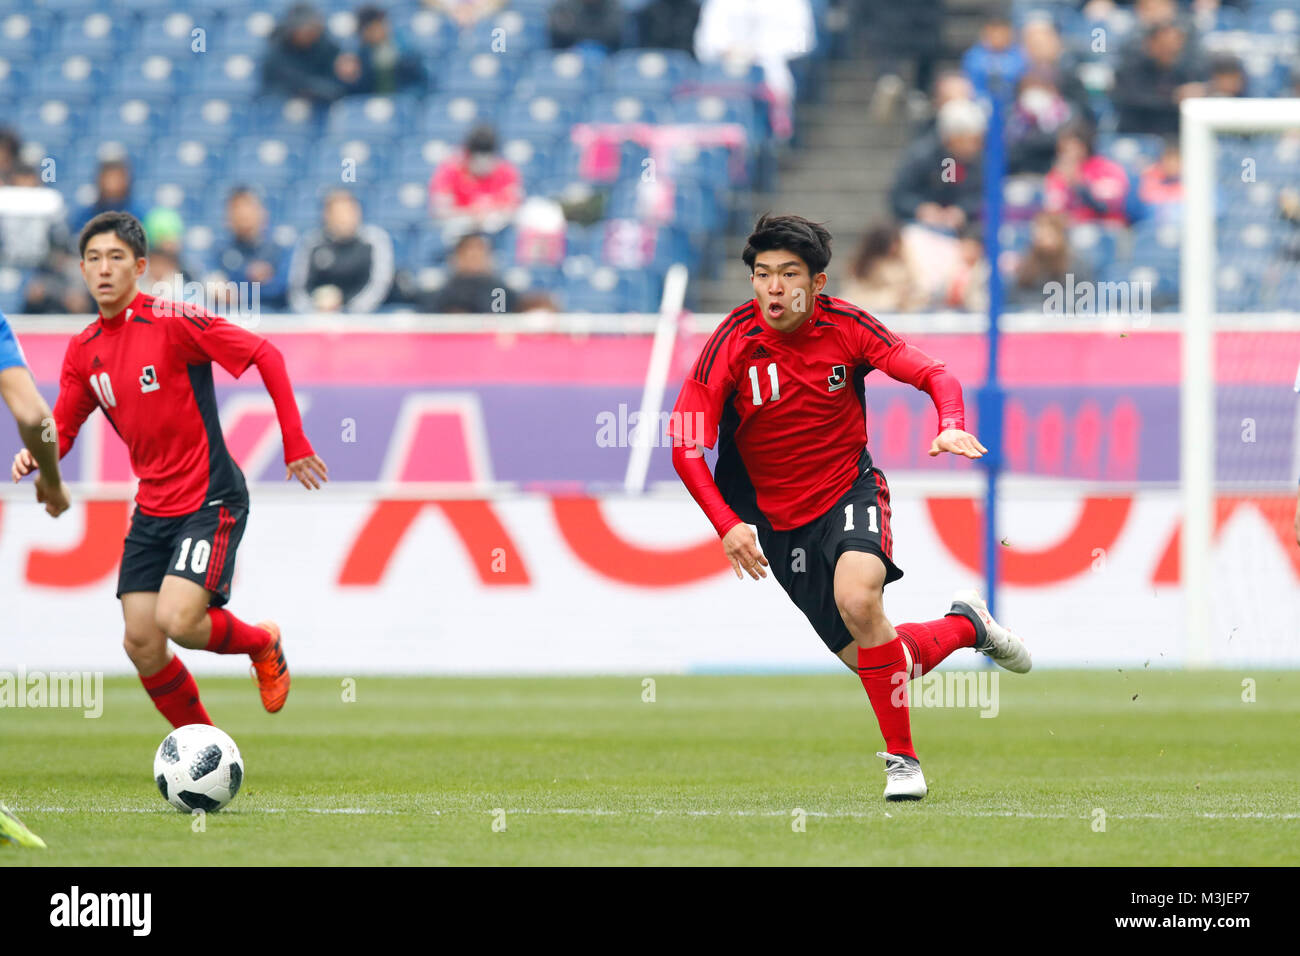 Saitama Japan 10th Feb 2018 Taisei Miyashiro U 18 J League